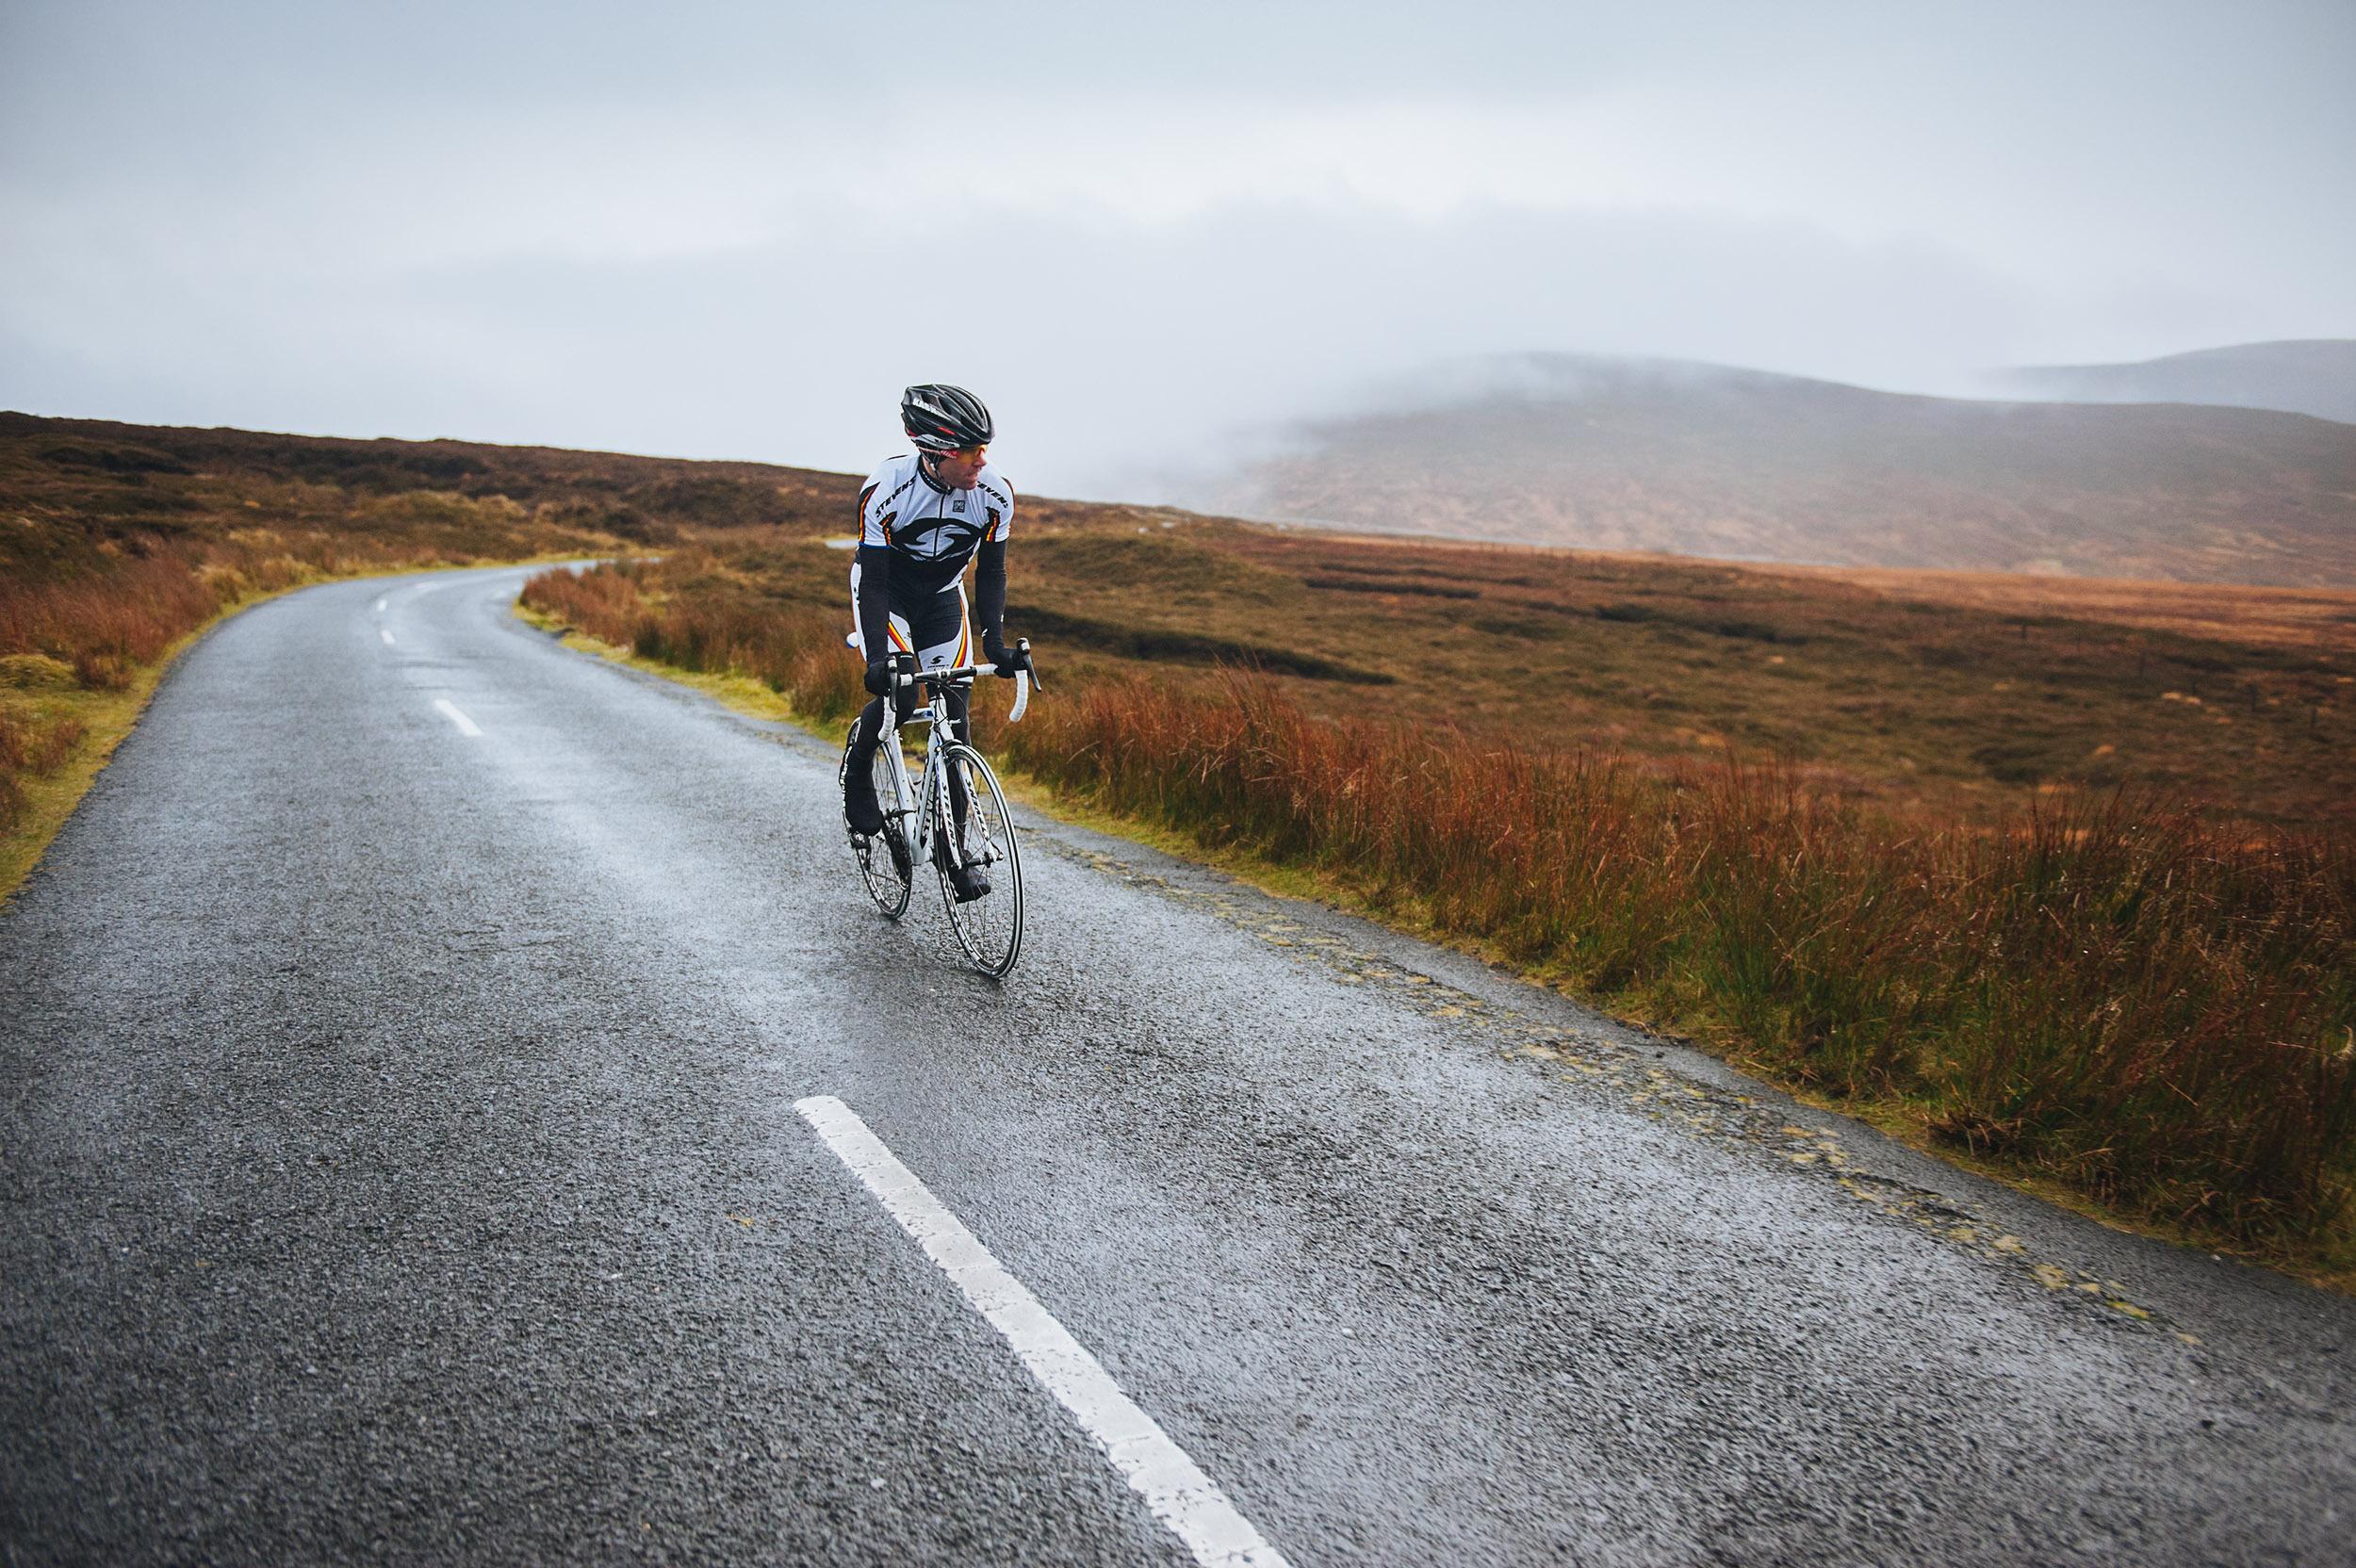 24-outdoor-ireland-mountains-wicklow-cycling-road-bike.jpg